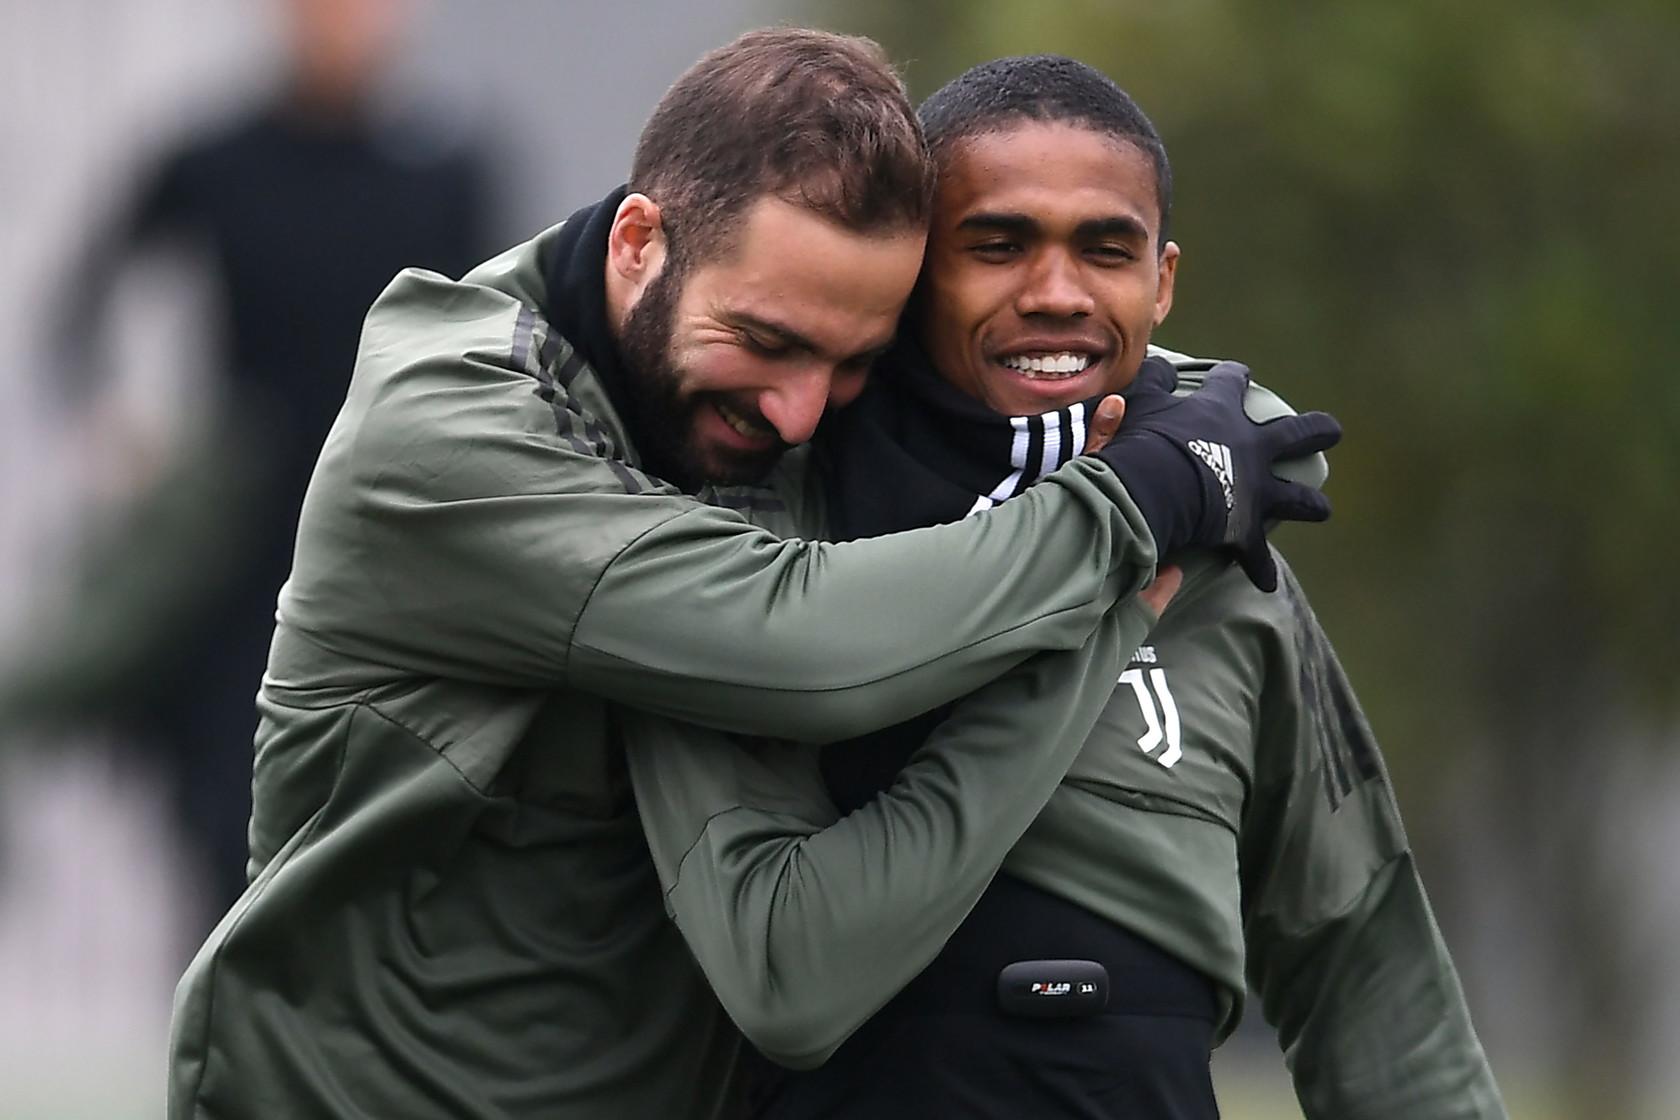 Mercato Juventus Non Solo Jimenez Premier League Chiave Per Le Cessioni News Sportmediaset